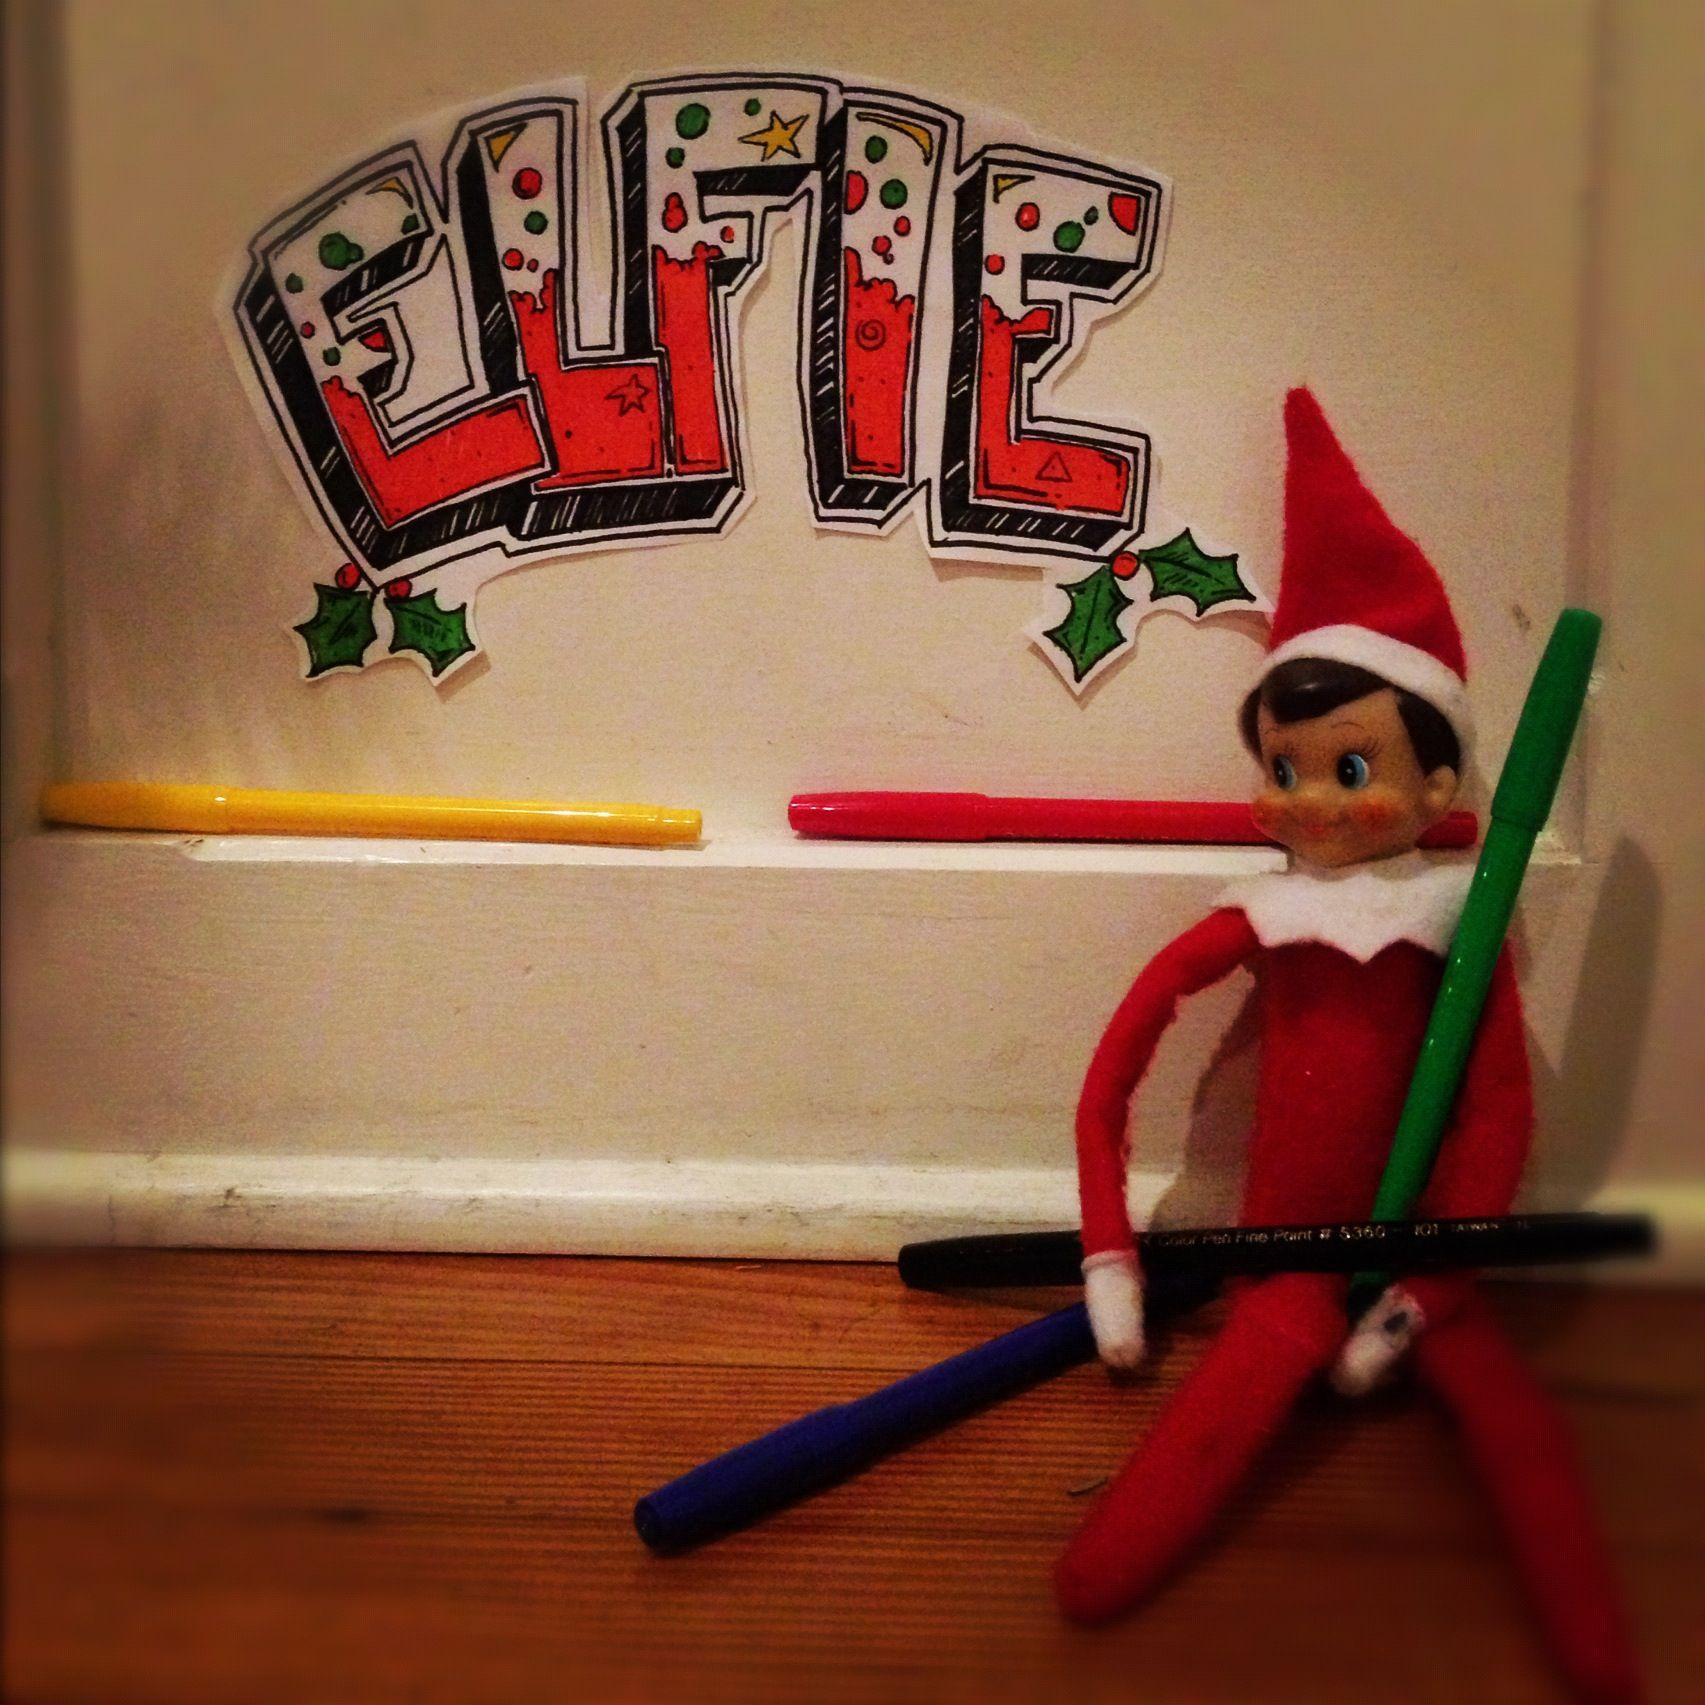 Christmas Graffiti Background.Elf Graffiti Elf On The Shelf Ideas Elf On The Shelf